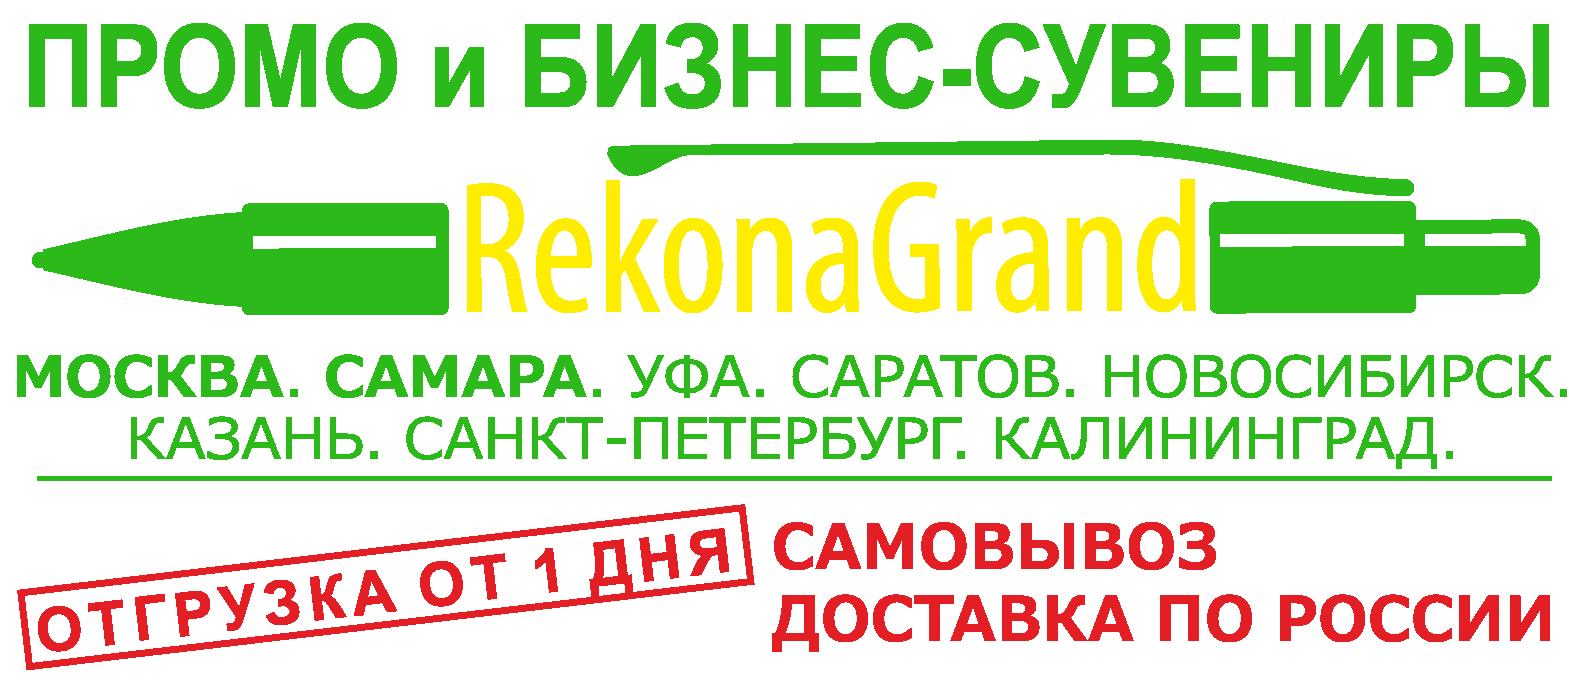 Каталог сувенирной продукции ROSGIFTS.RU